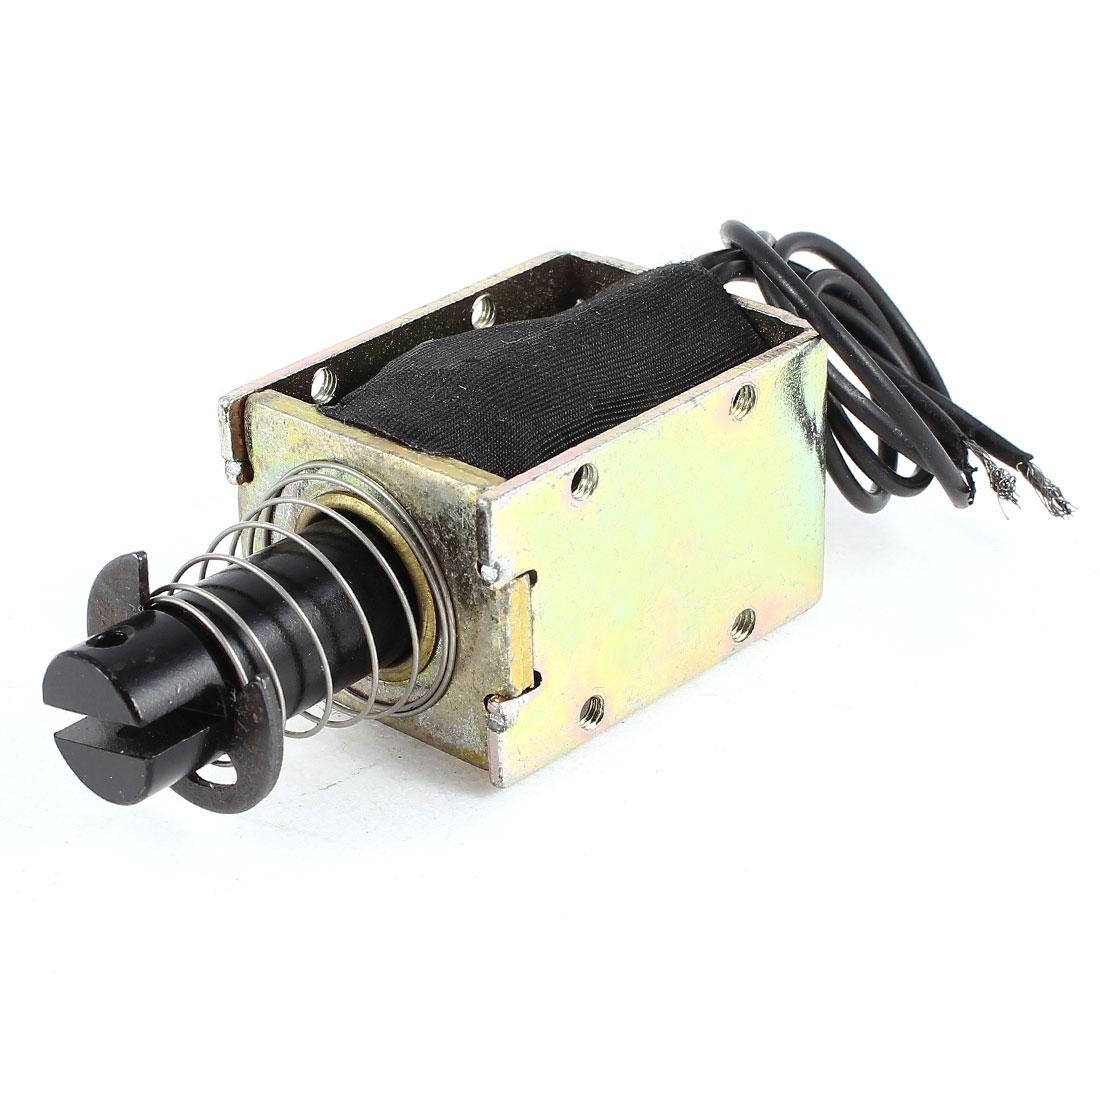 DC 24V 2.66A 15mm Stroke 5LB 2.2Kg Pull Type Open Frame Eletric Actuator Solenoid Electromagnet